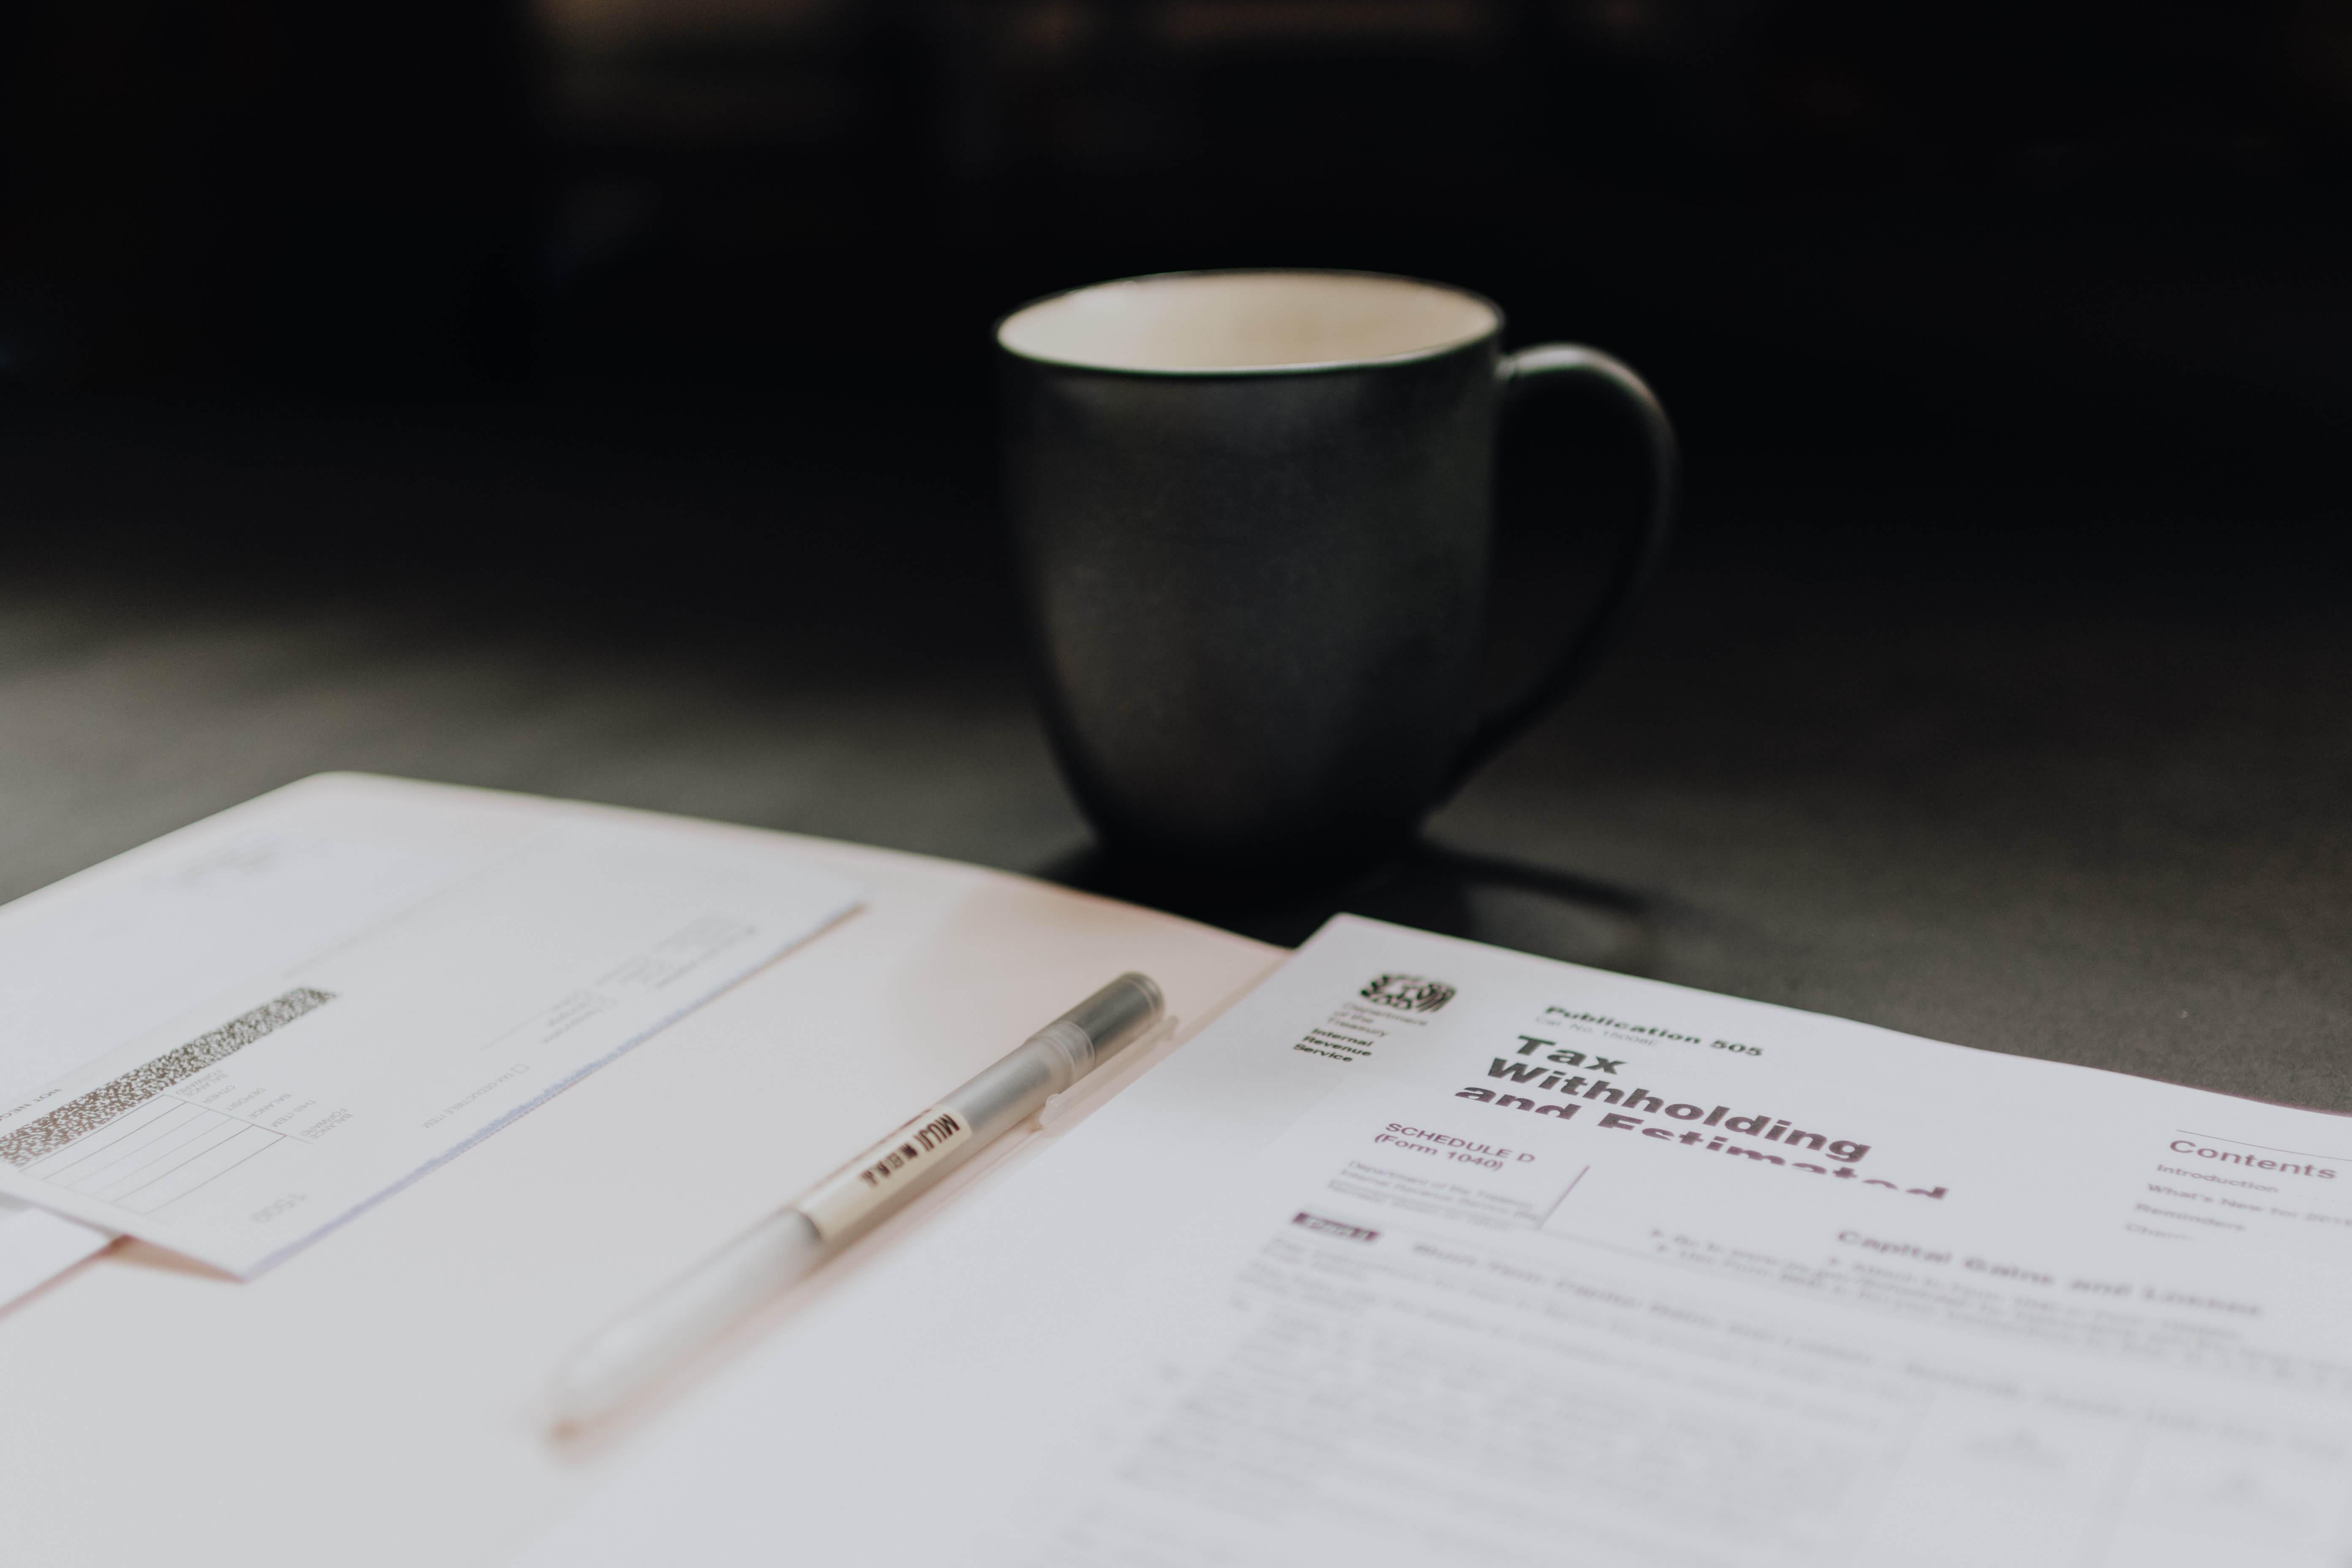 1099 Deadline 2020 - New Form